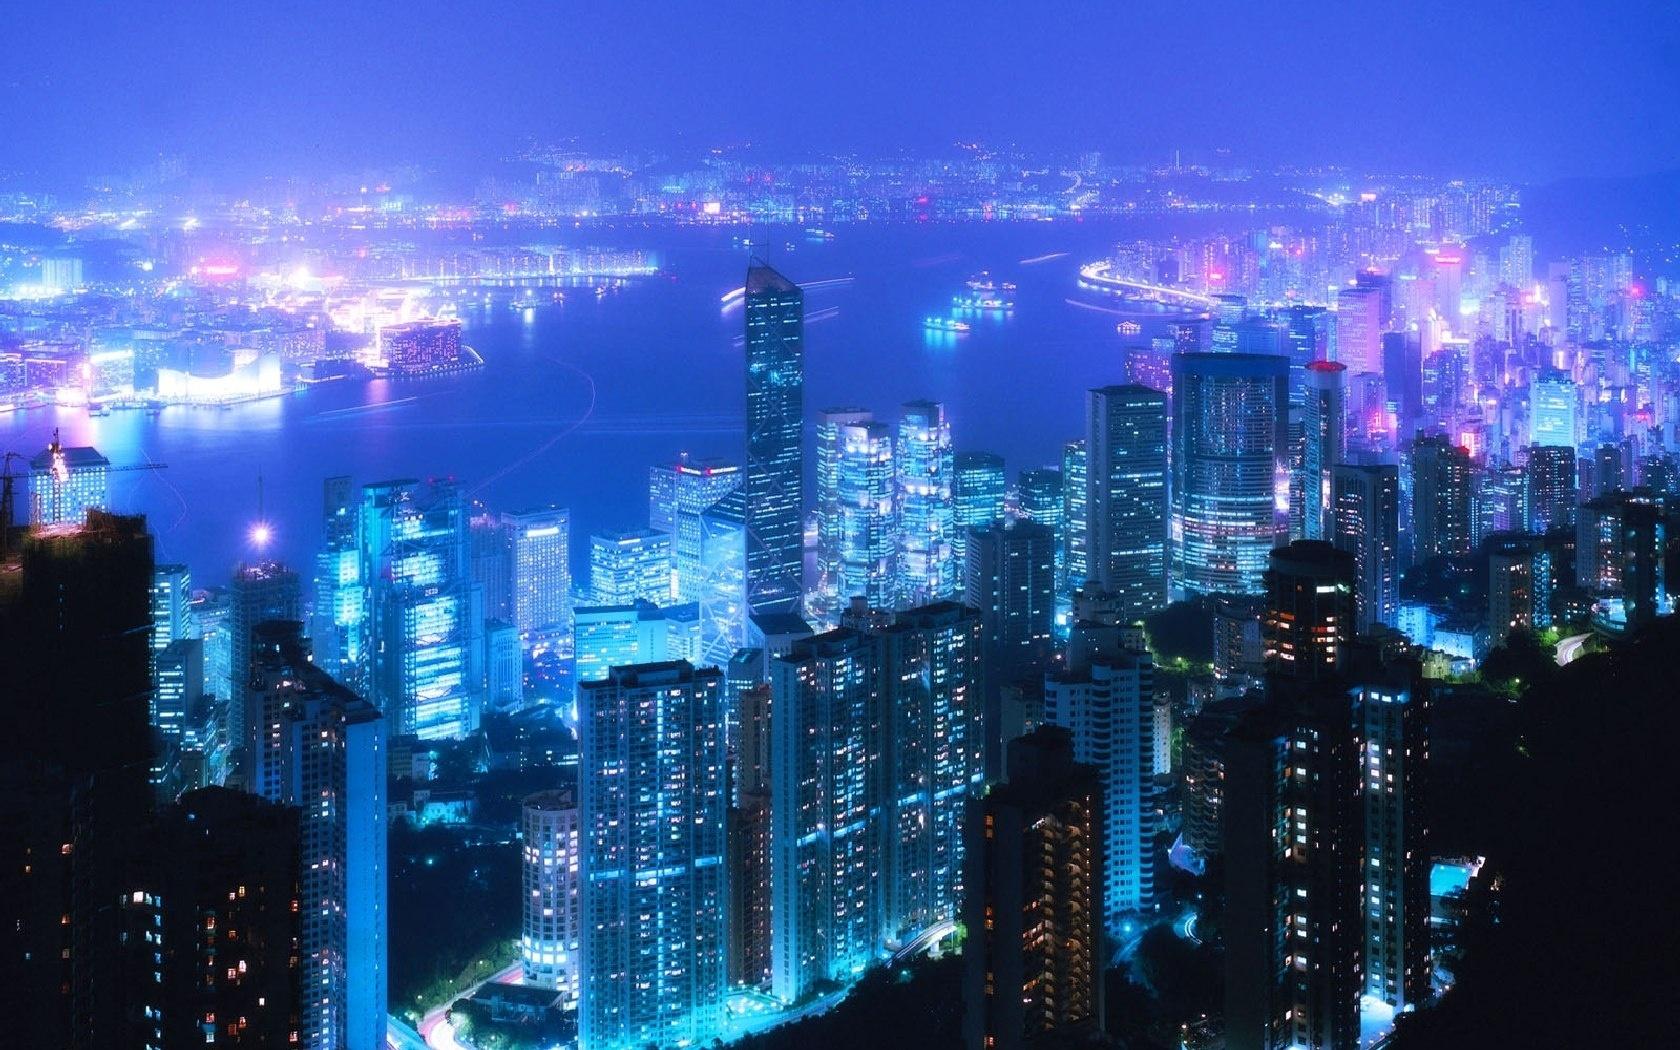 City Night Tokyo Lanterns Sky Homes wallpaper #56853